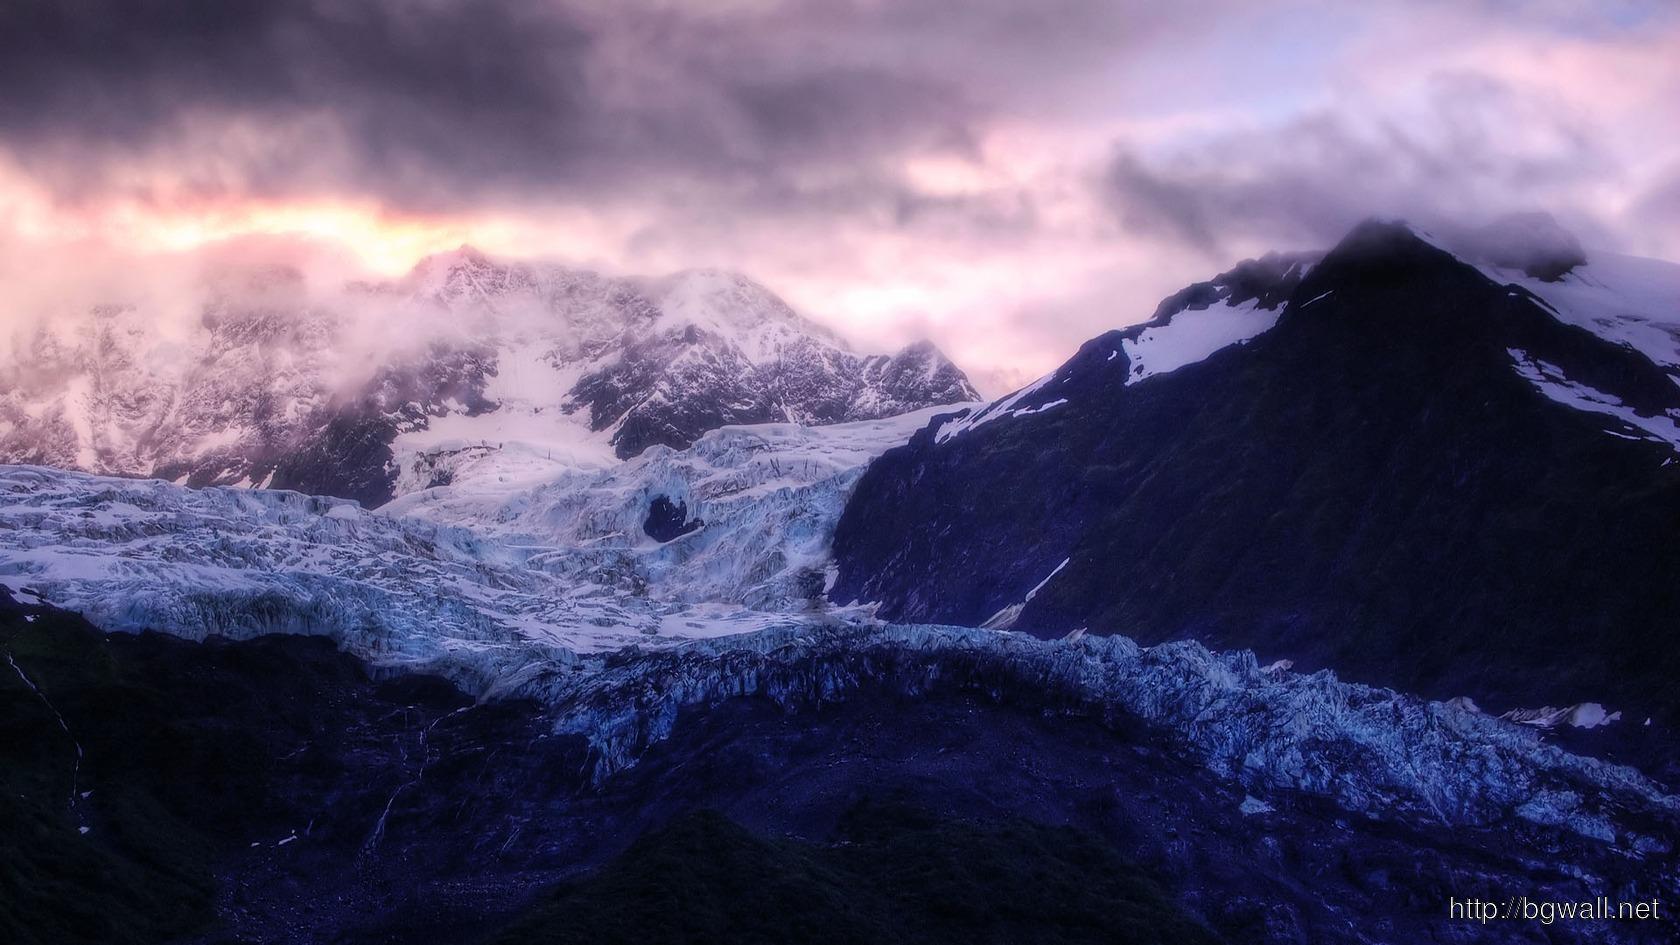 Glacier Wallpaper 2562 Full Size